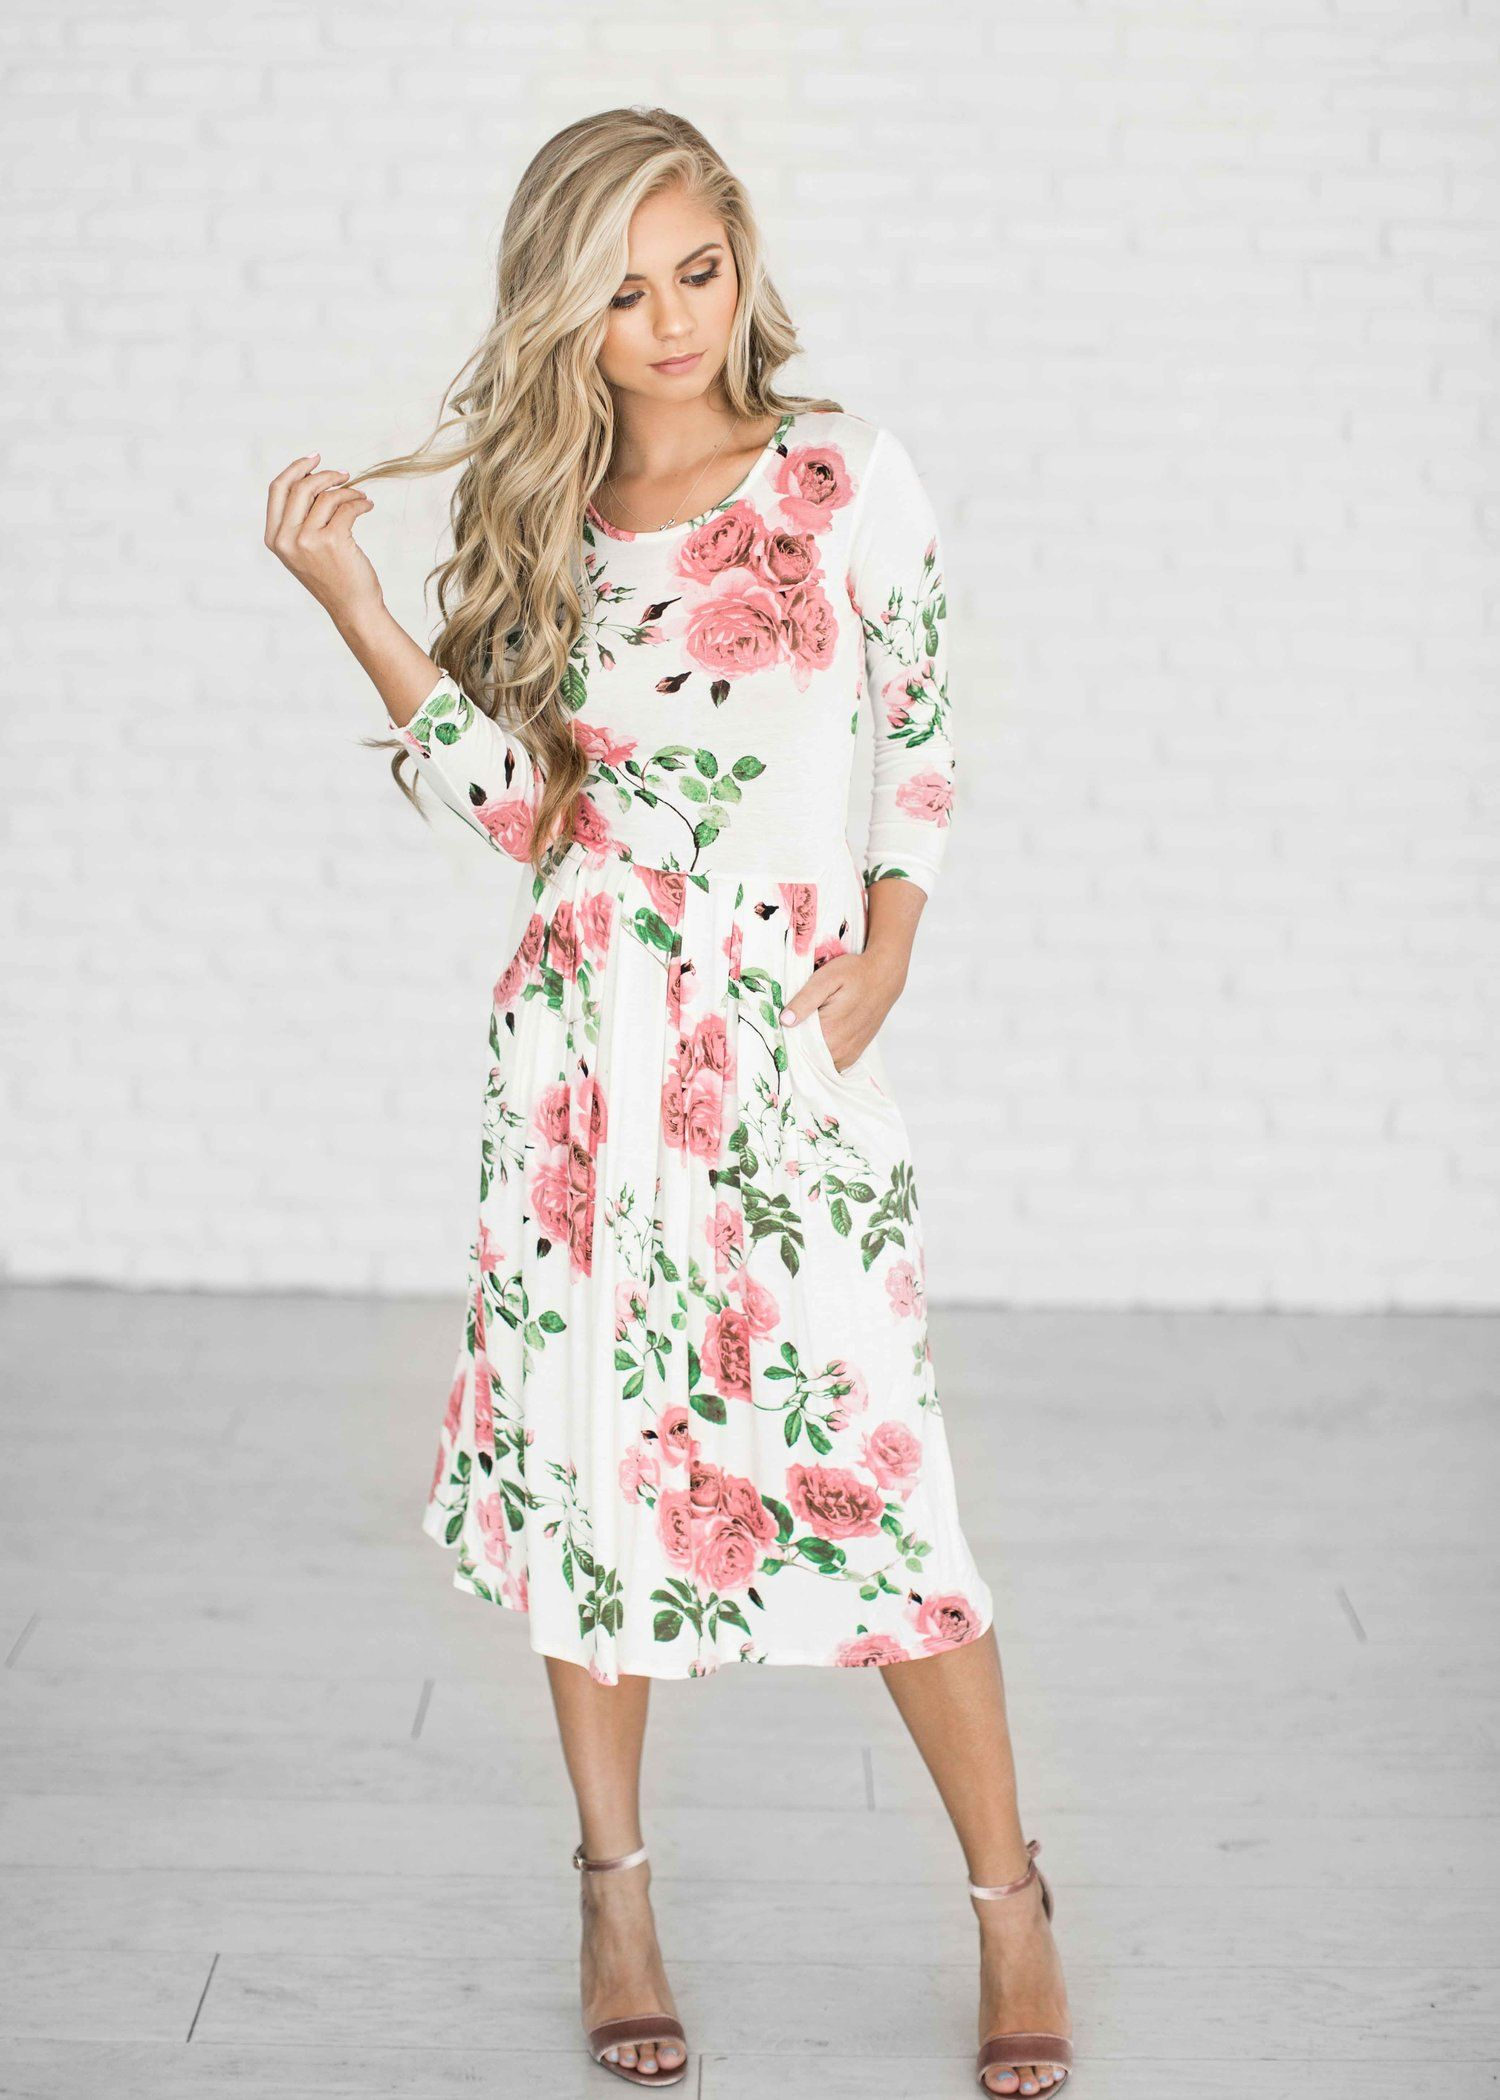 Floral Sky Maxi Dress | Sunday dress, Spring dresses and Fashion ...